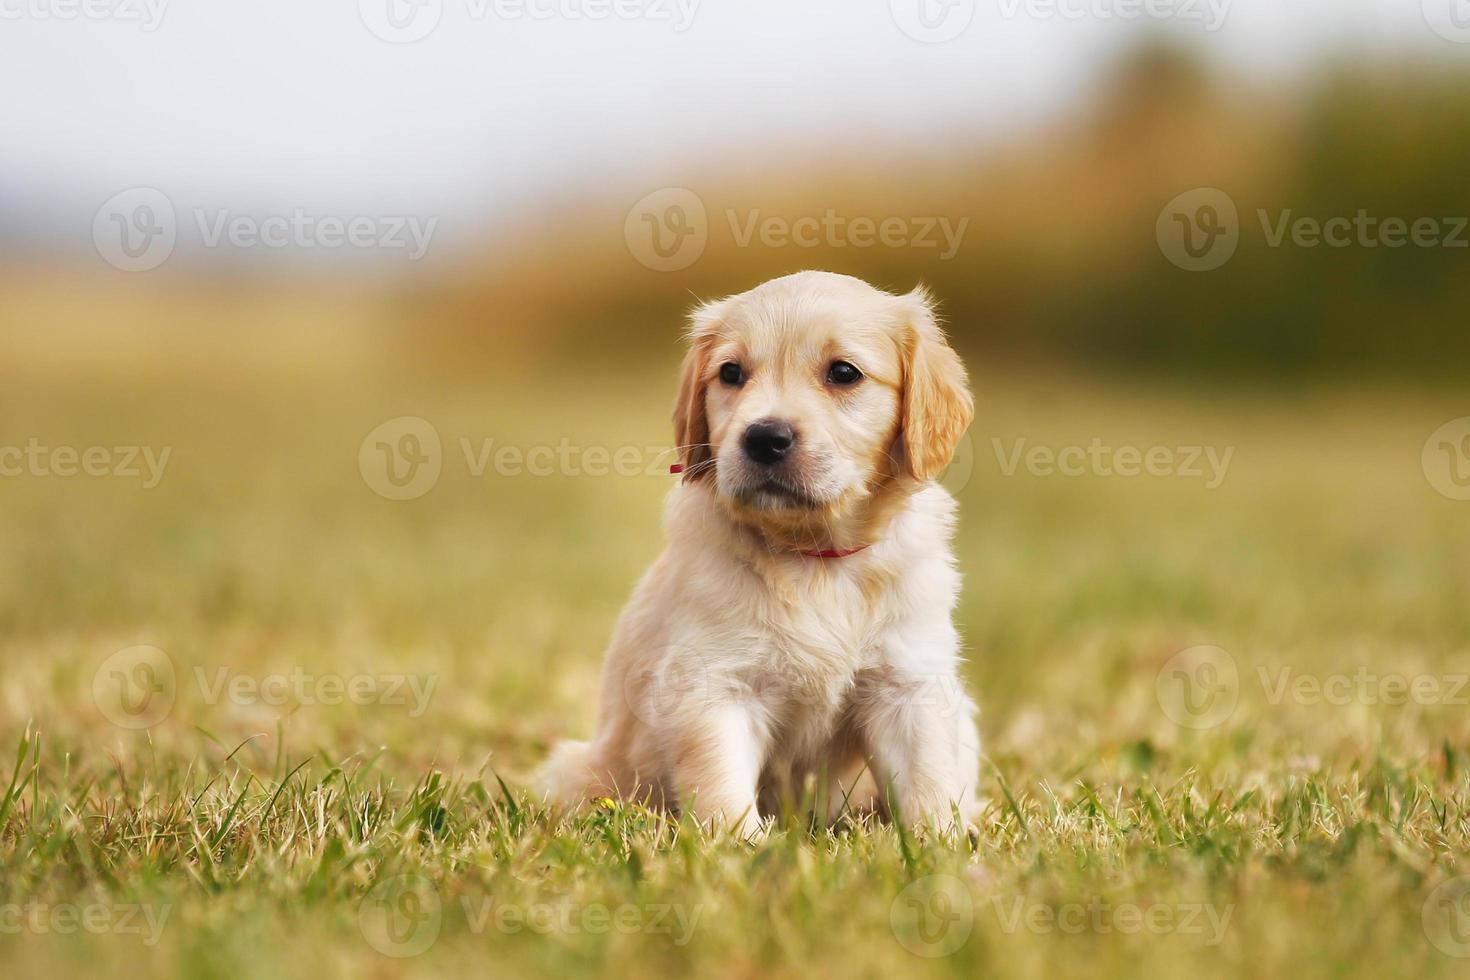 Golden retriever puppy standing in the sun photo